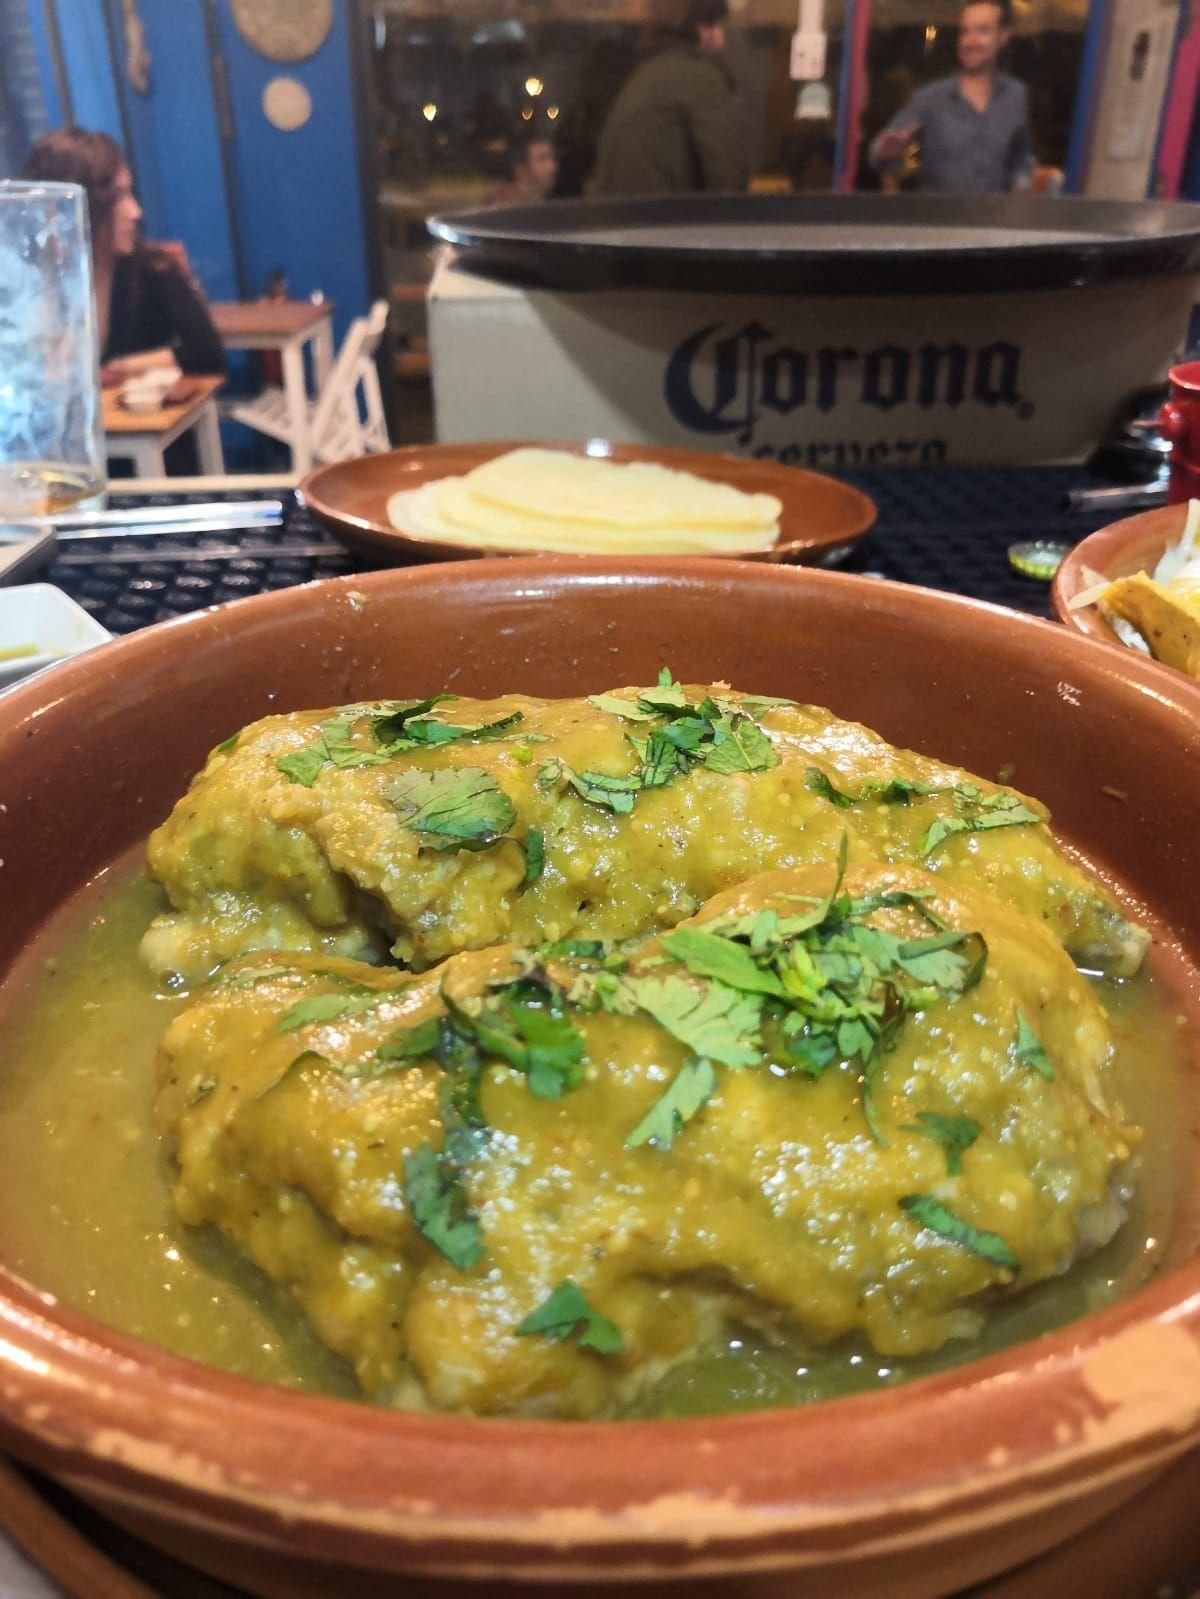 Foto 35 de Restaurante mexicano en  | Cantina La Catrina